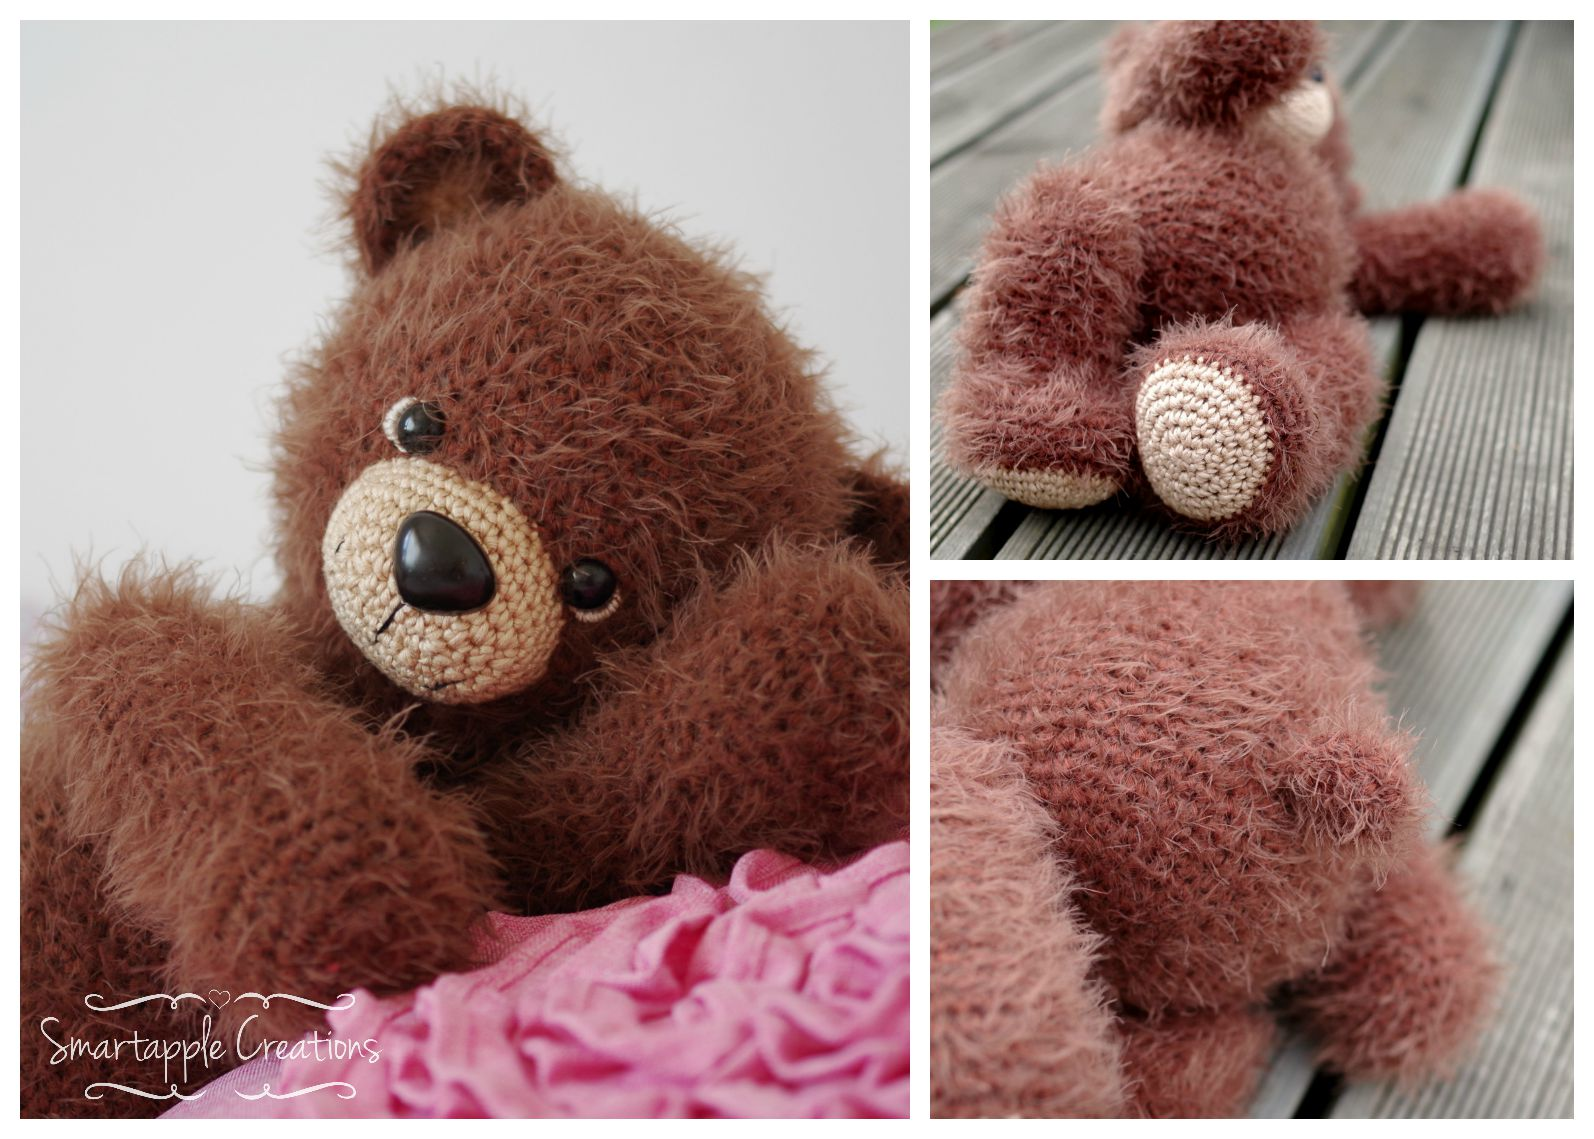 Amigurumi Big Bear : Smartapple Creations - amigurumi and crochet: Cuddly teddy ...